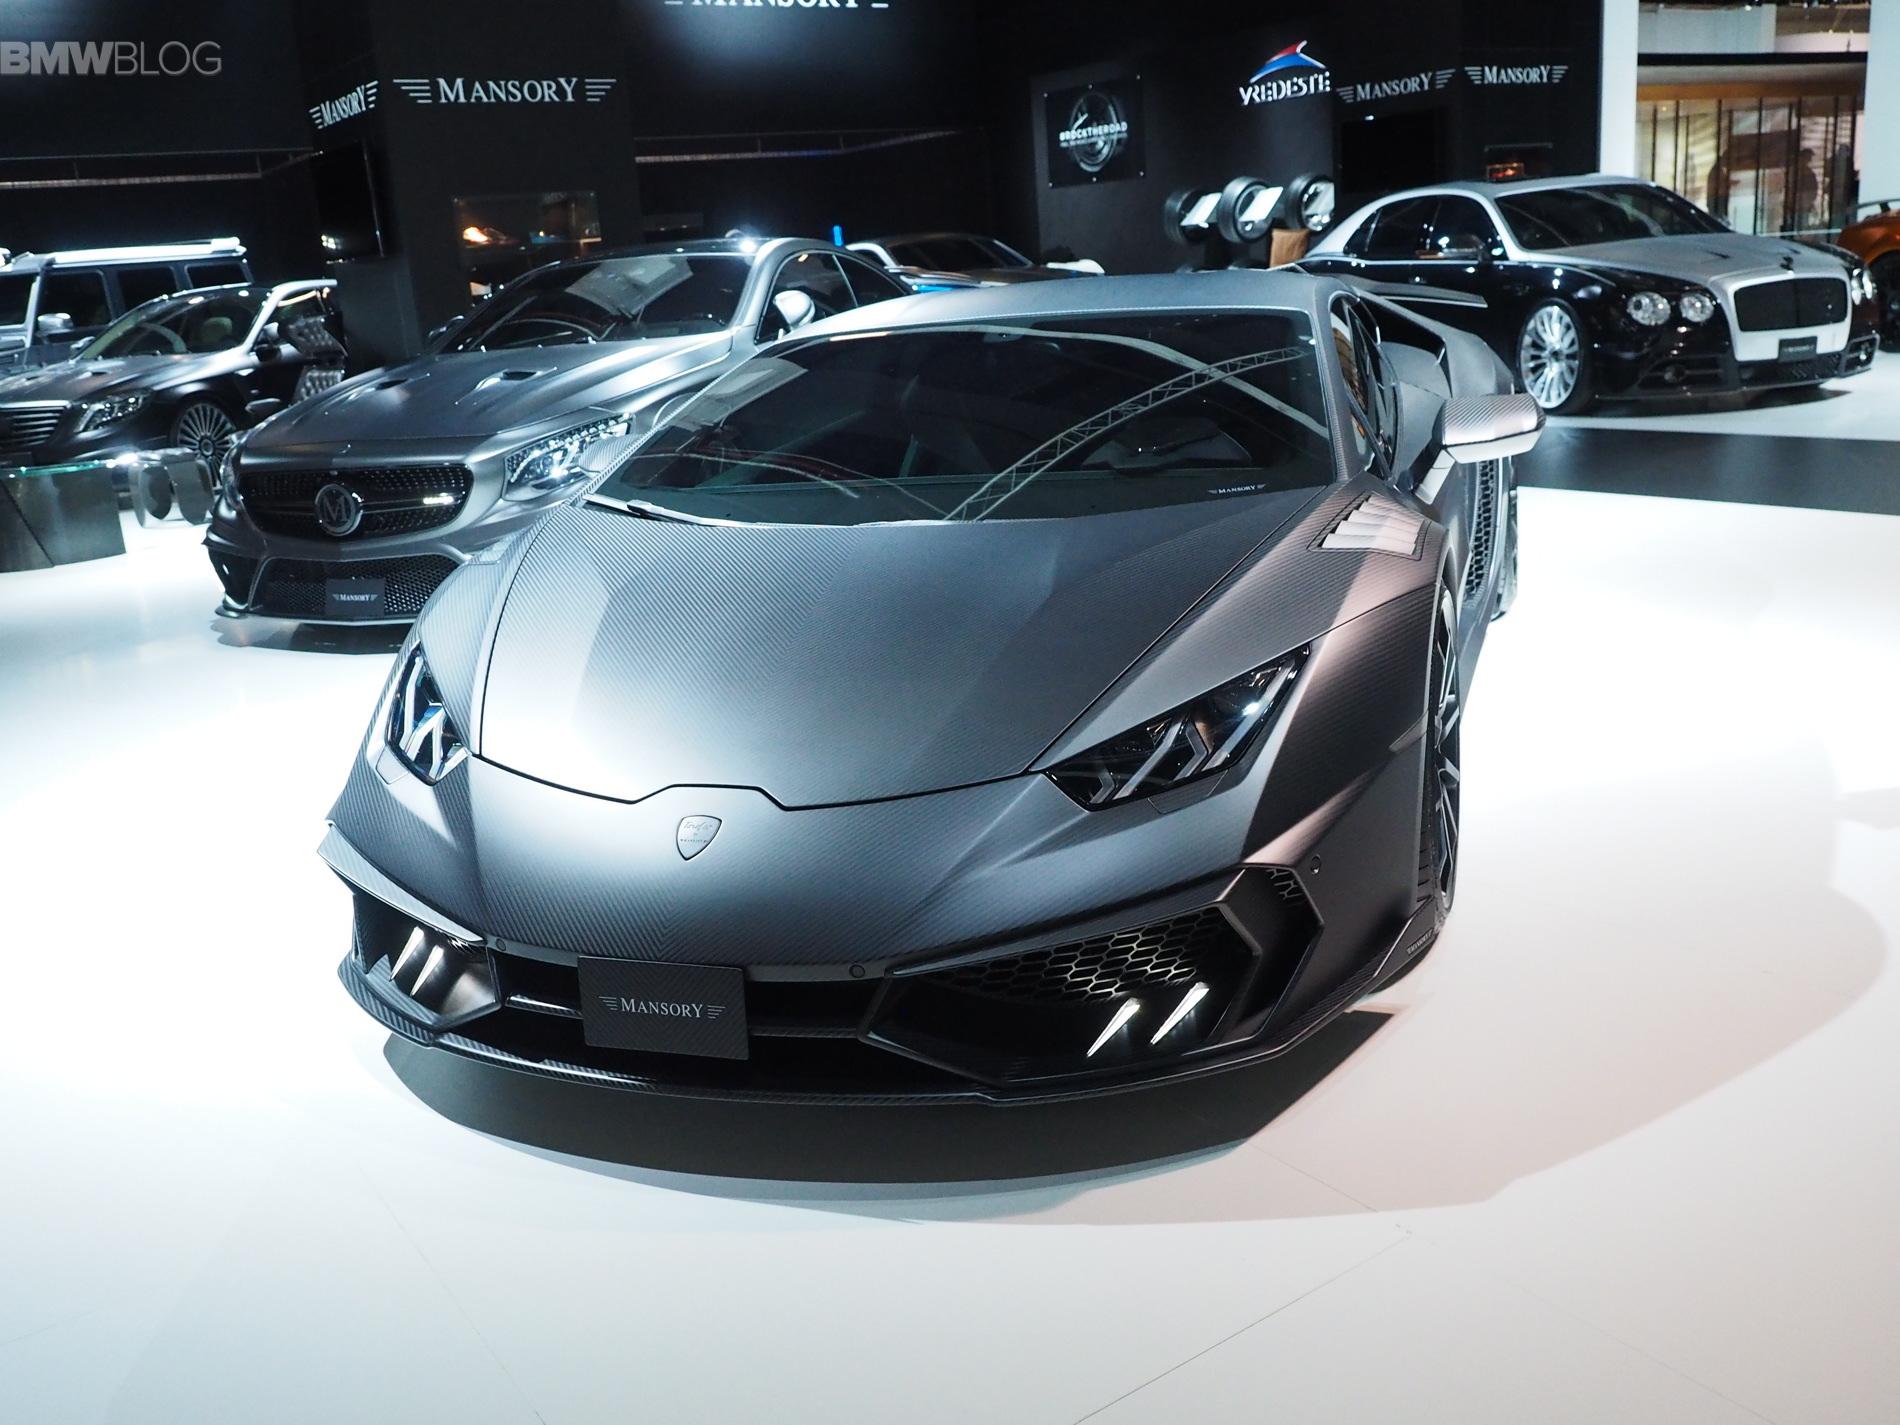 Mansory Lamborghini Huracan images 01